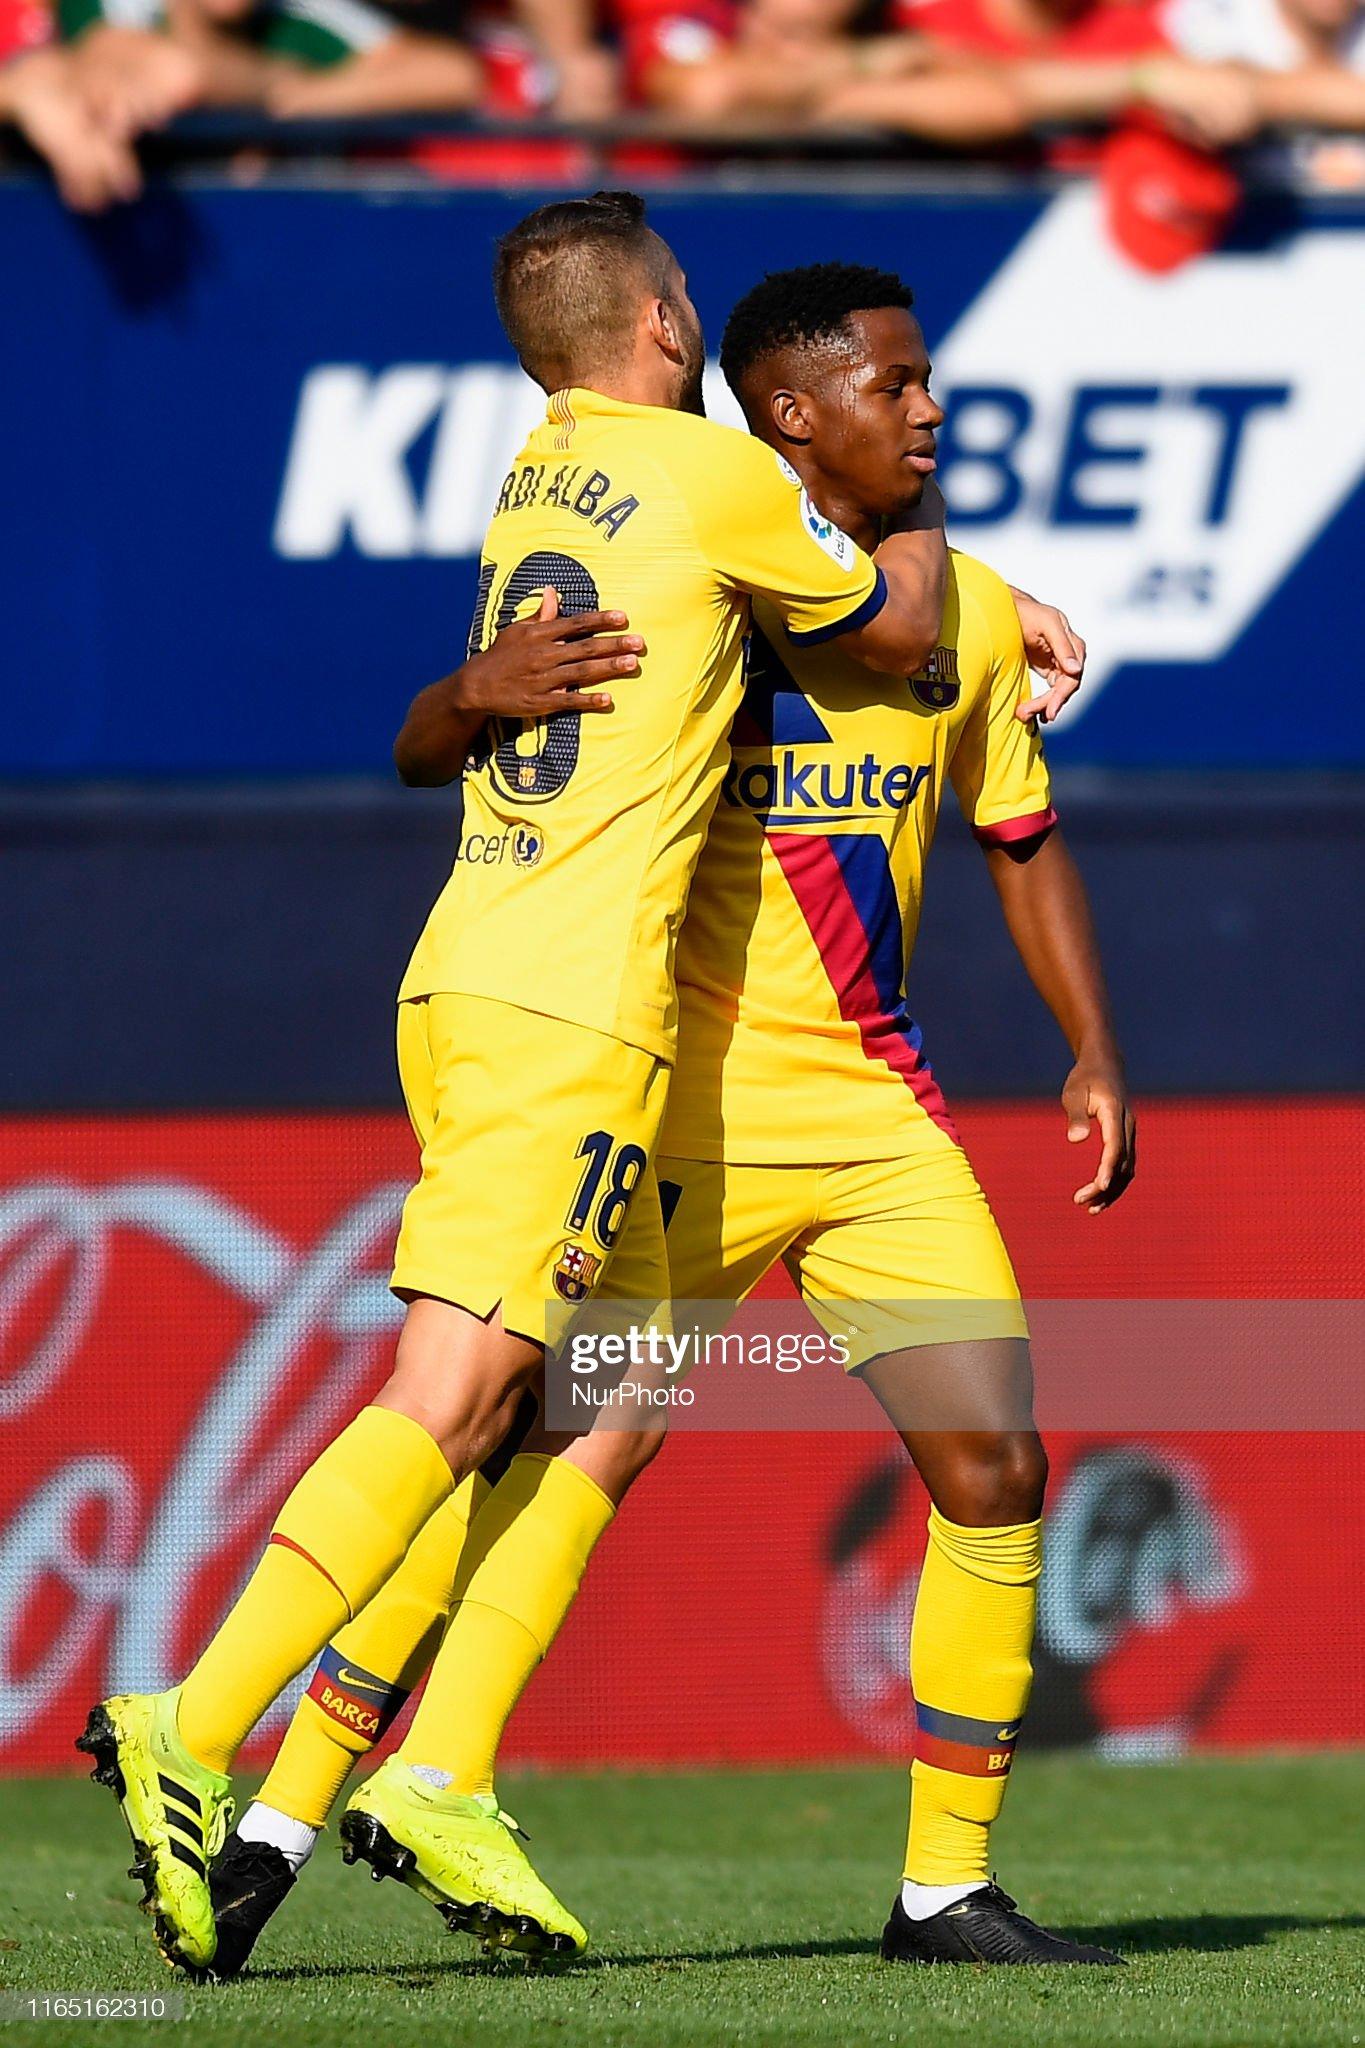 صور مباراة : أوساسونا - برشلونة 2-2 ( 31-08-2019 )  Ansu-fati-of-barcelona-celebrates-after-scoring-his-sides-first-goal-picture-id1165162310?s=2048x2048